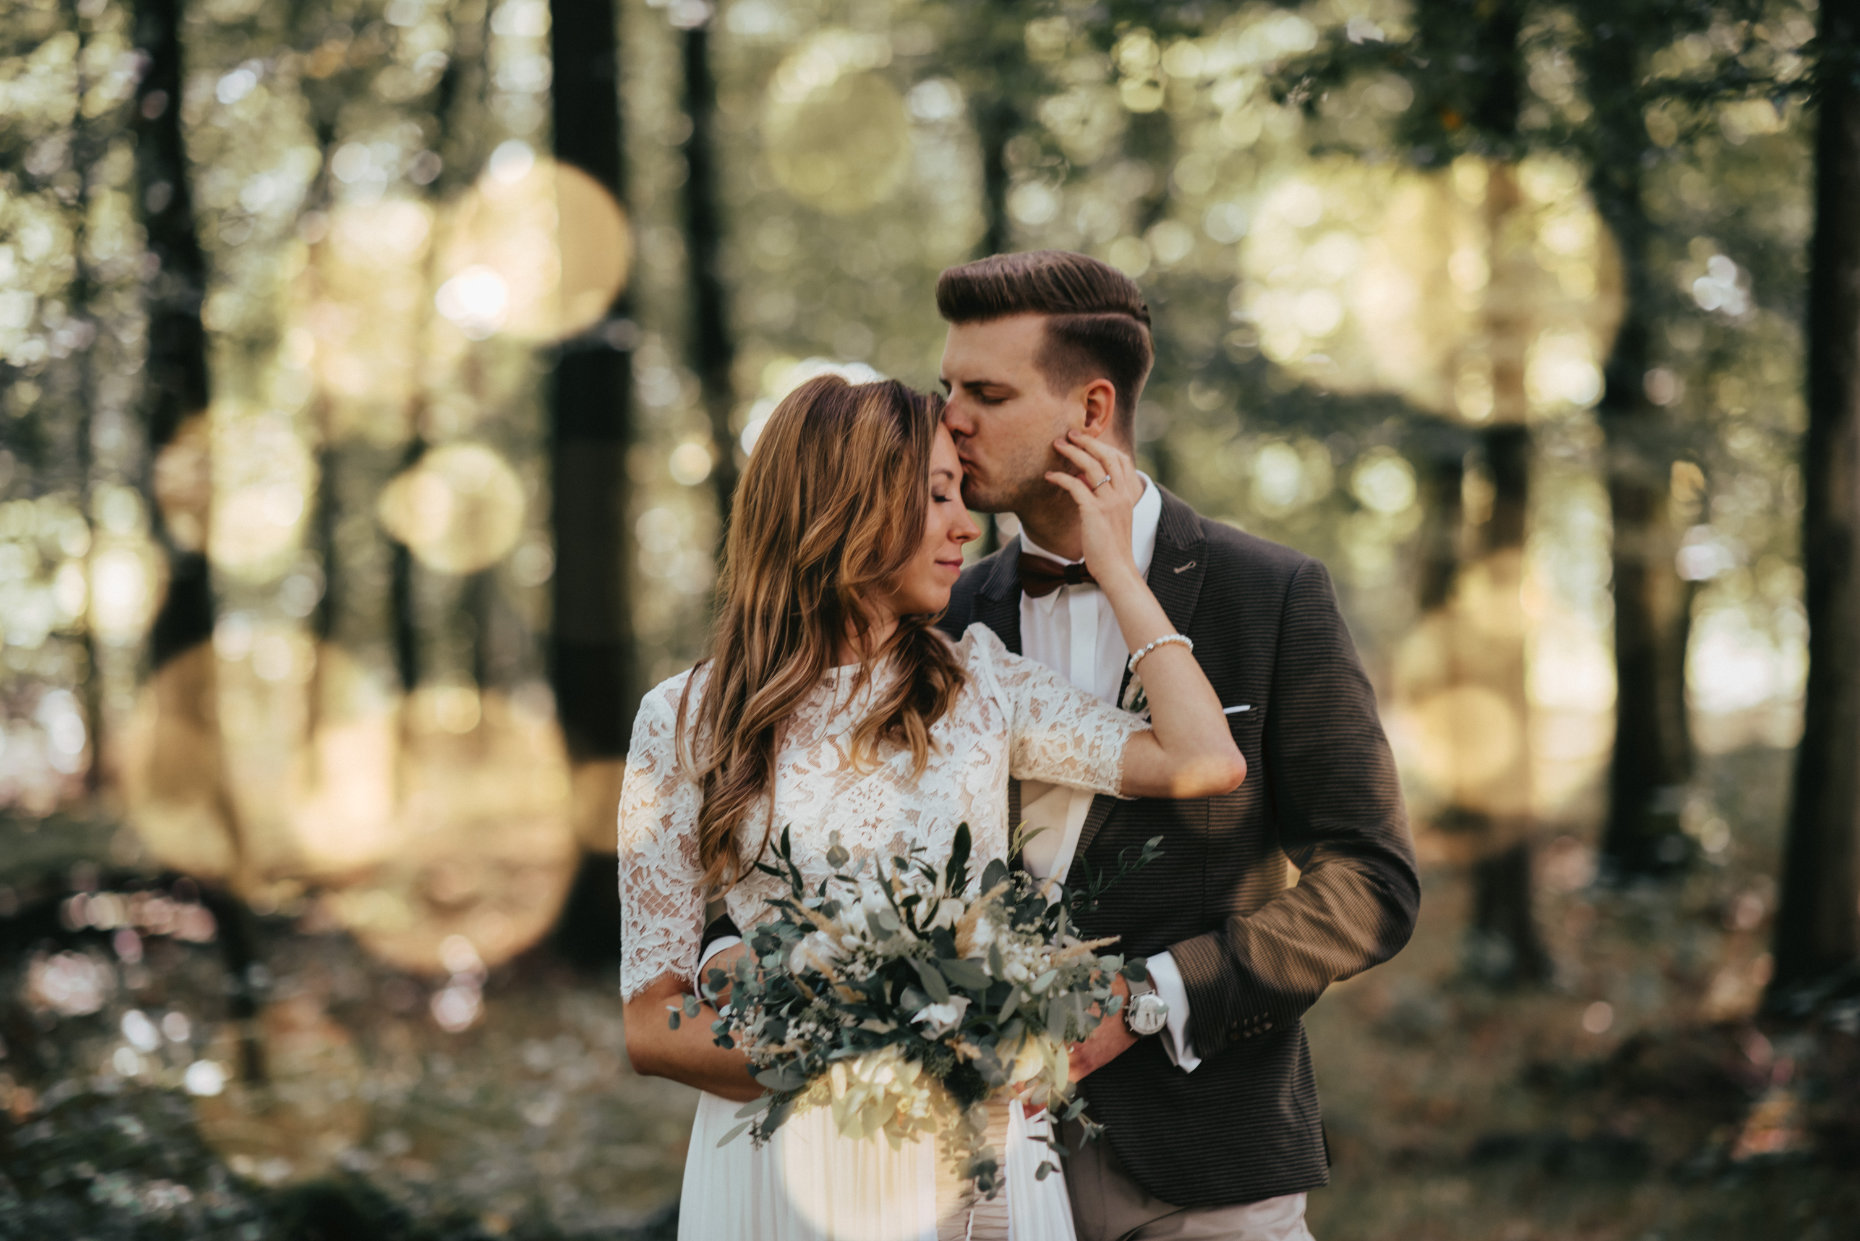 Boho-Hochzeitspaar im Wald